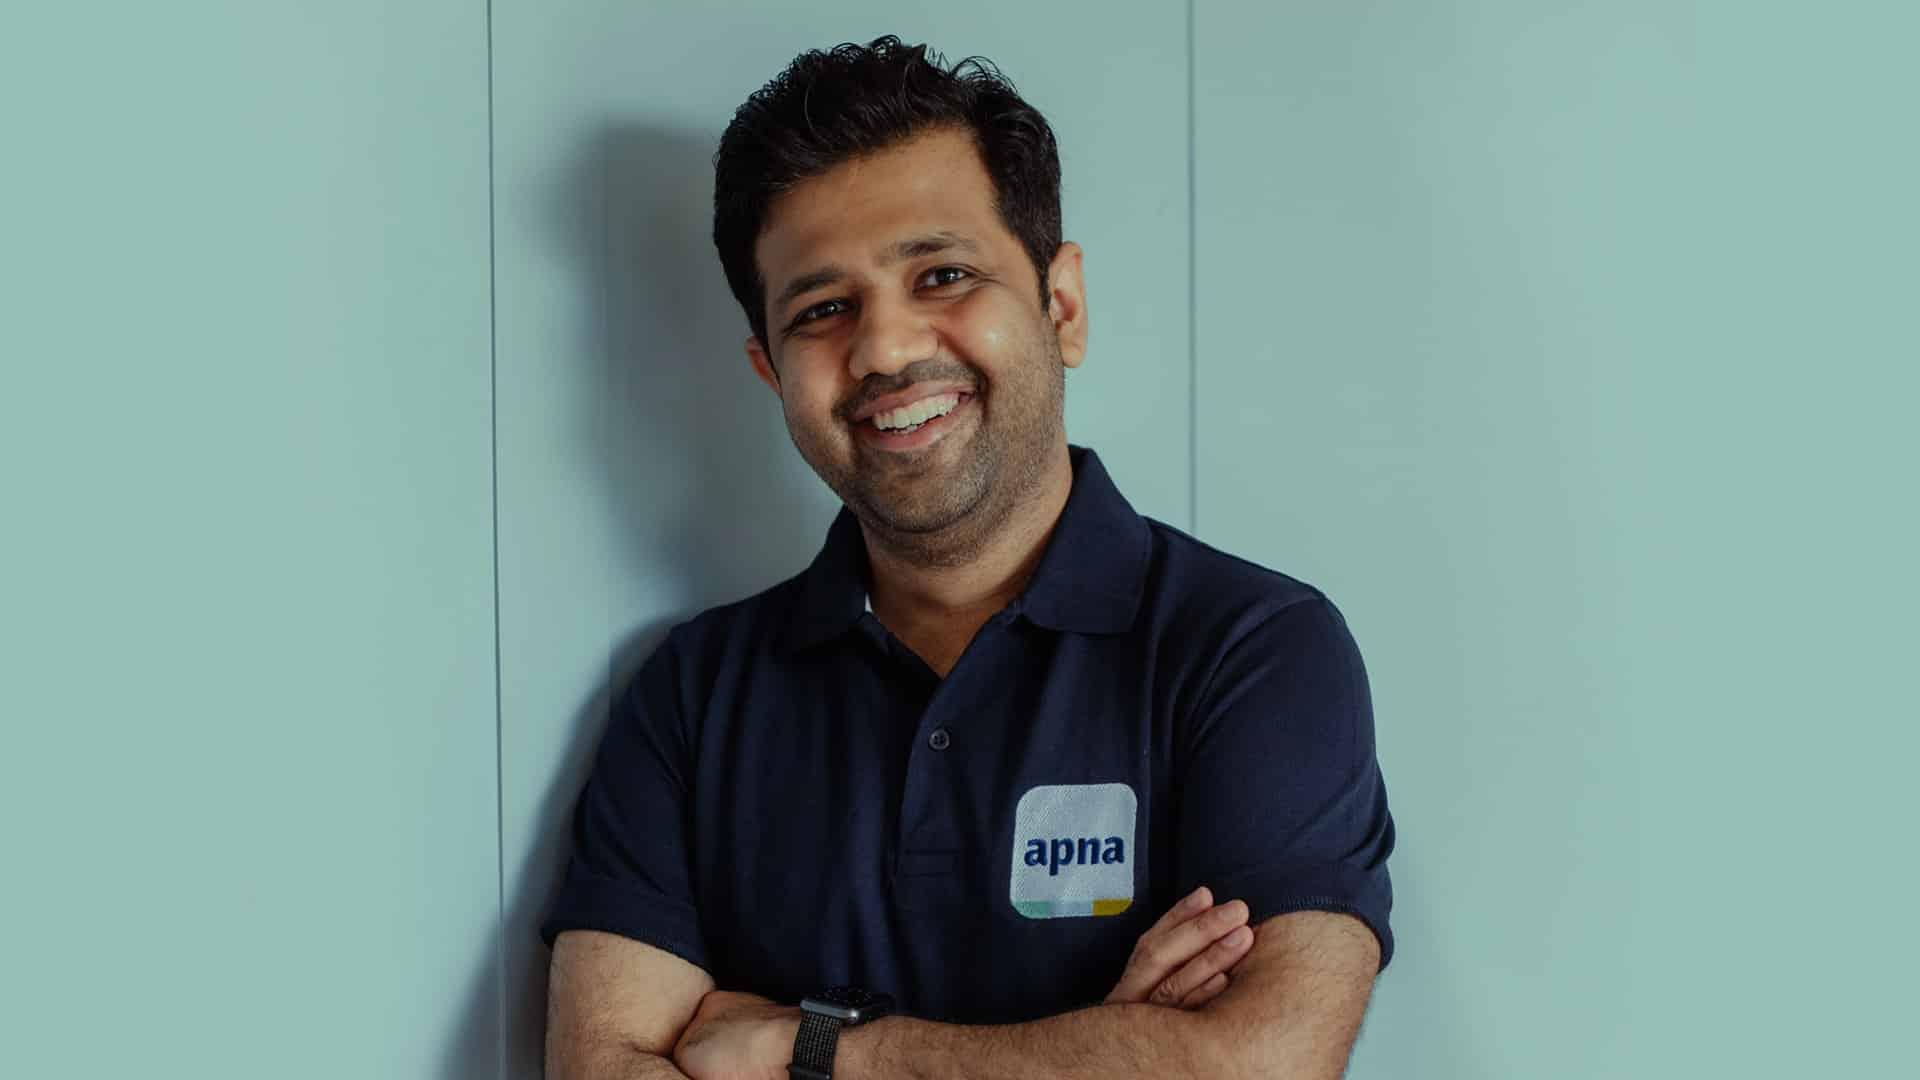 Blue-collar job App Apna enters unicorn club after USD 100 mn fundraise